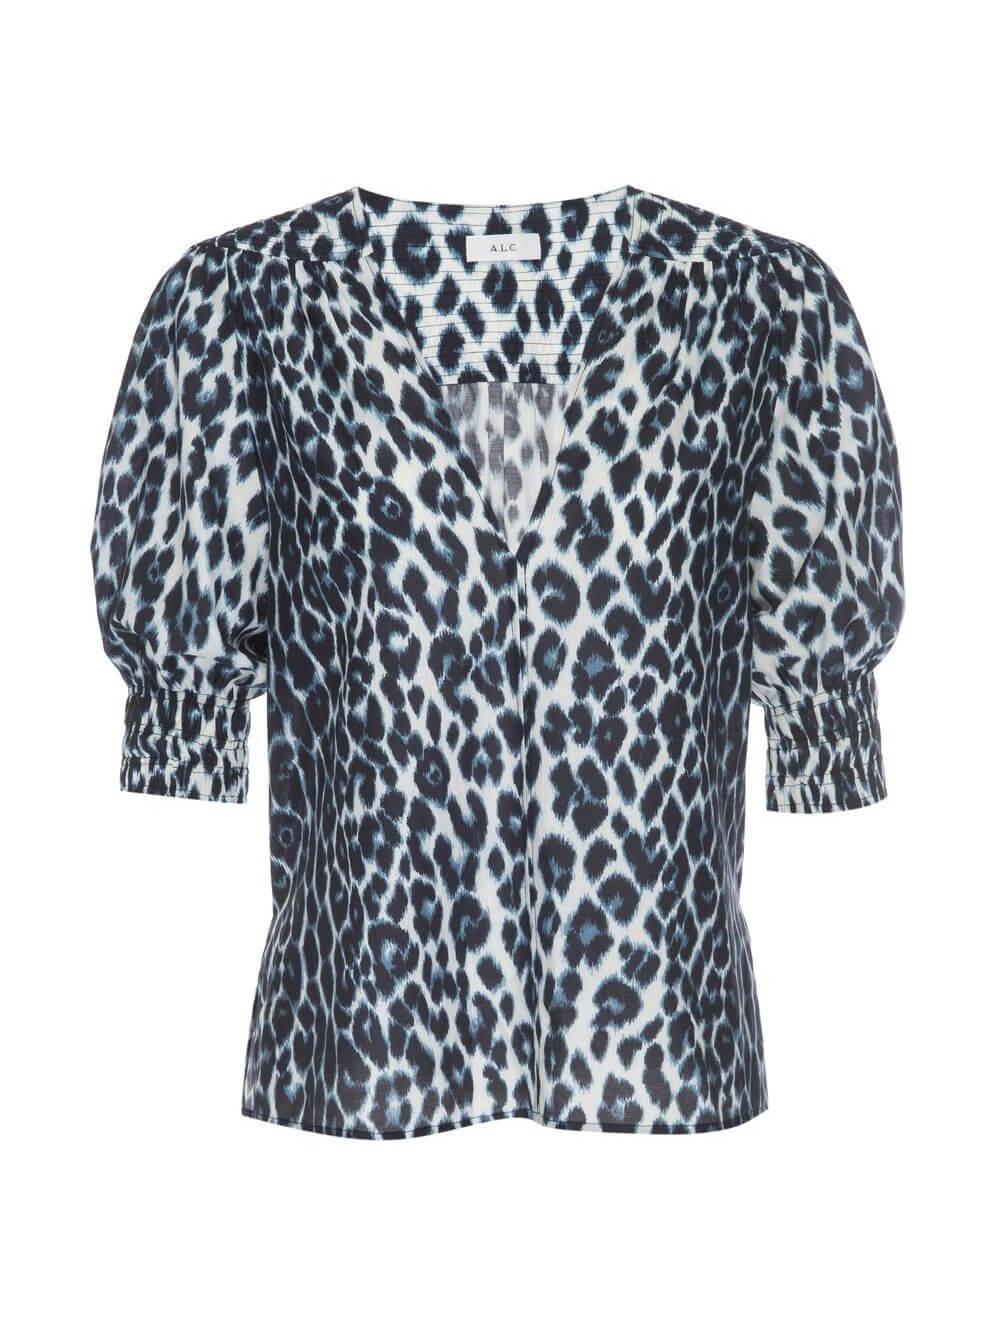 Elton Leopard Print Top